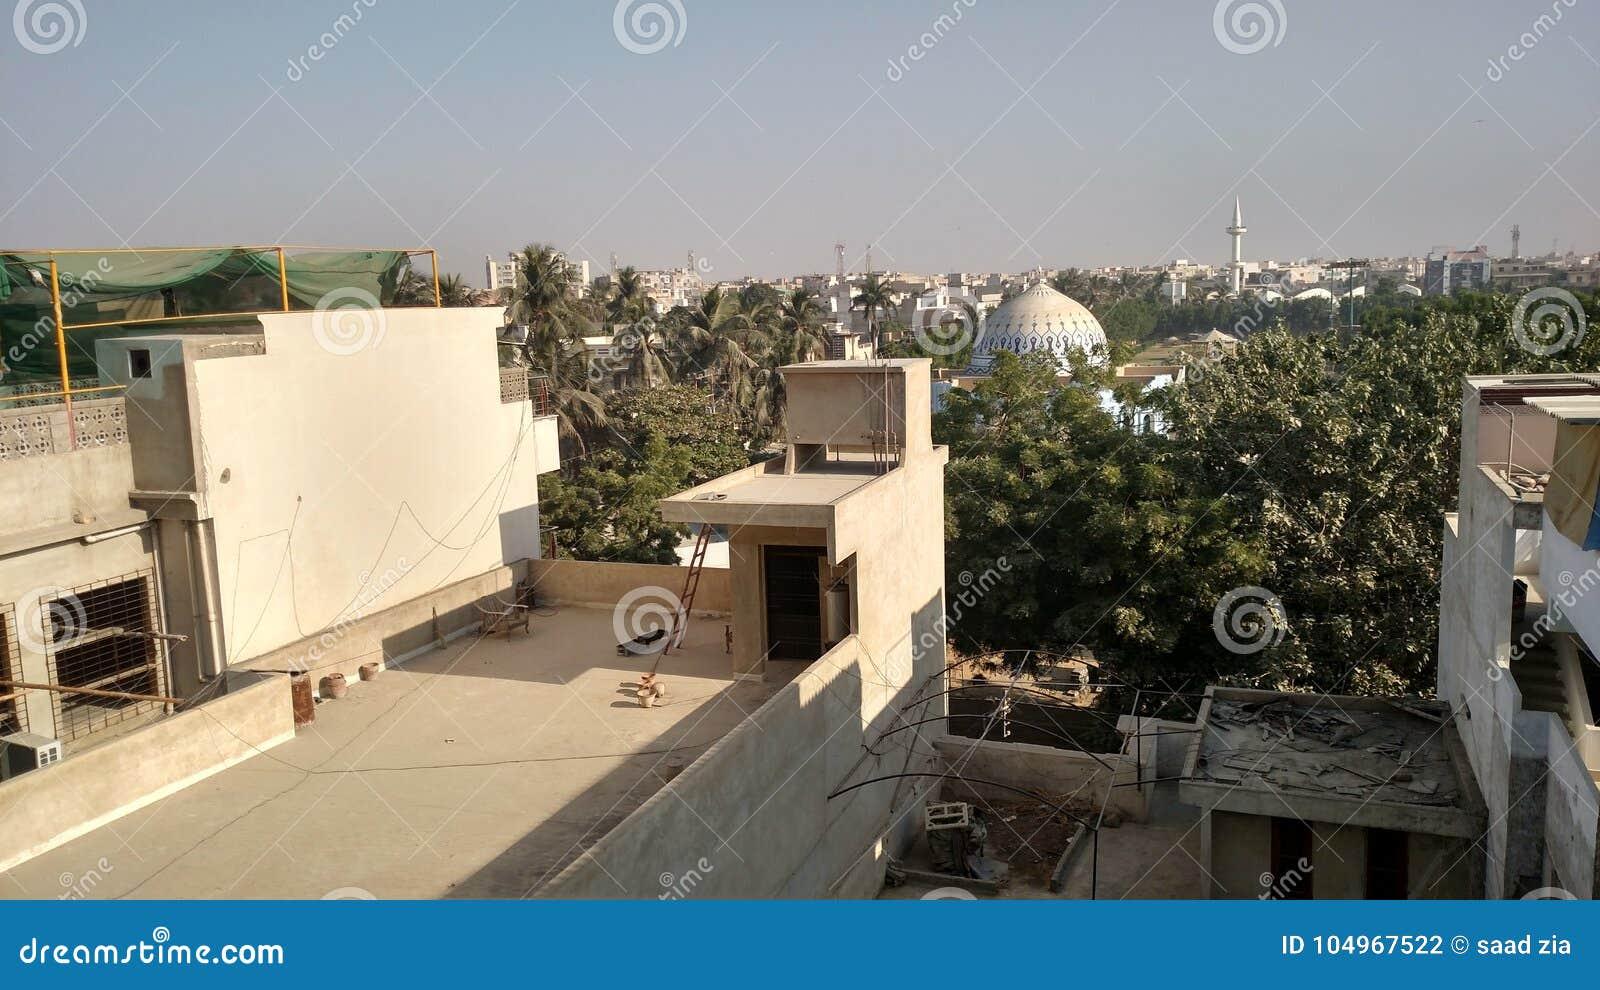 Karachi stock photo  Image of area, street, muslim, nation